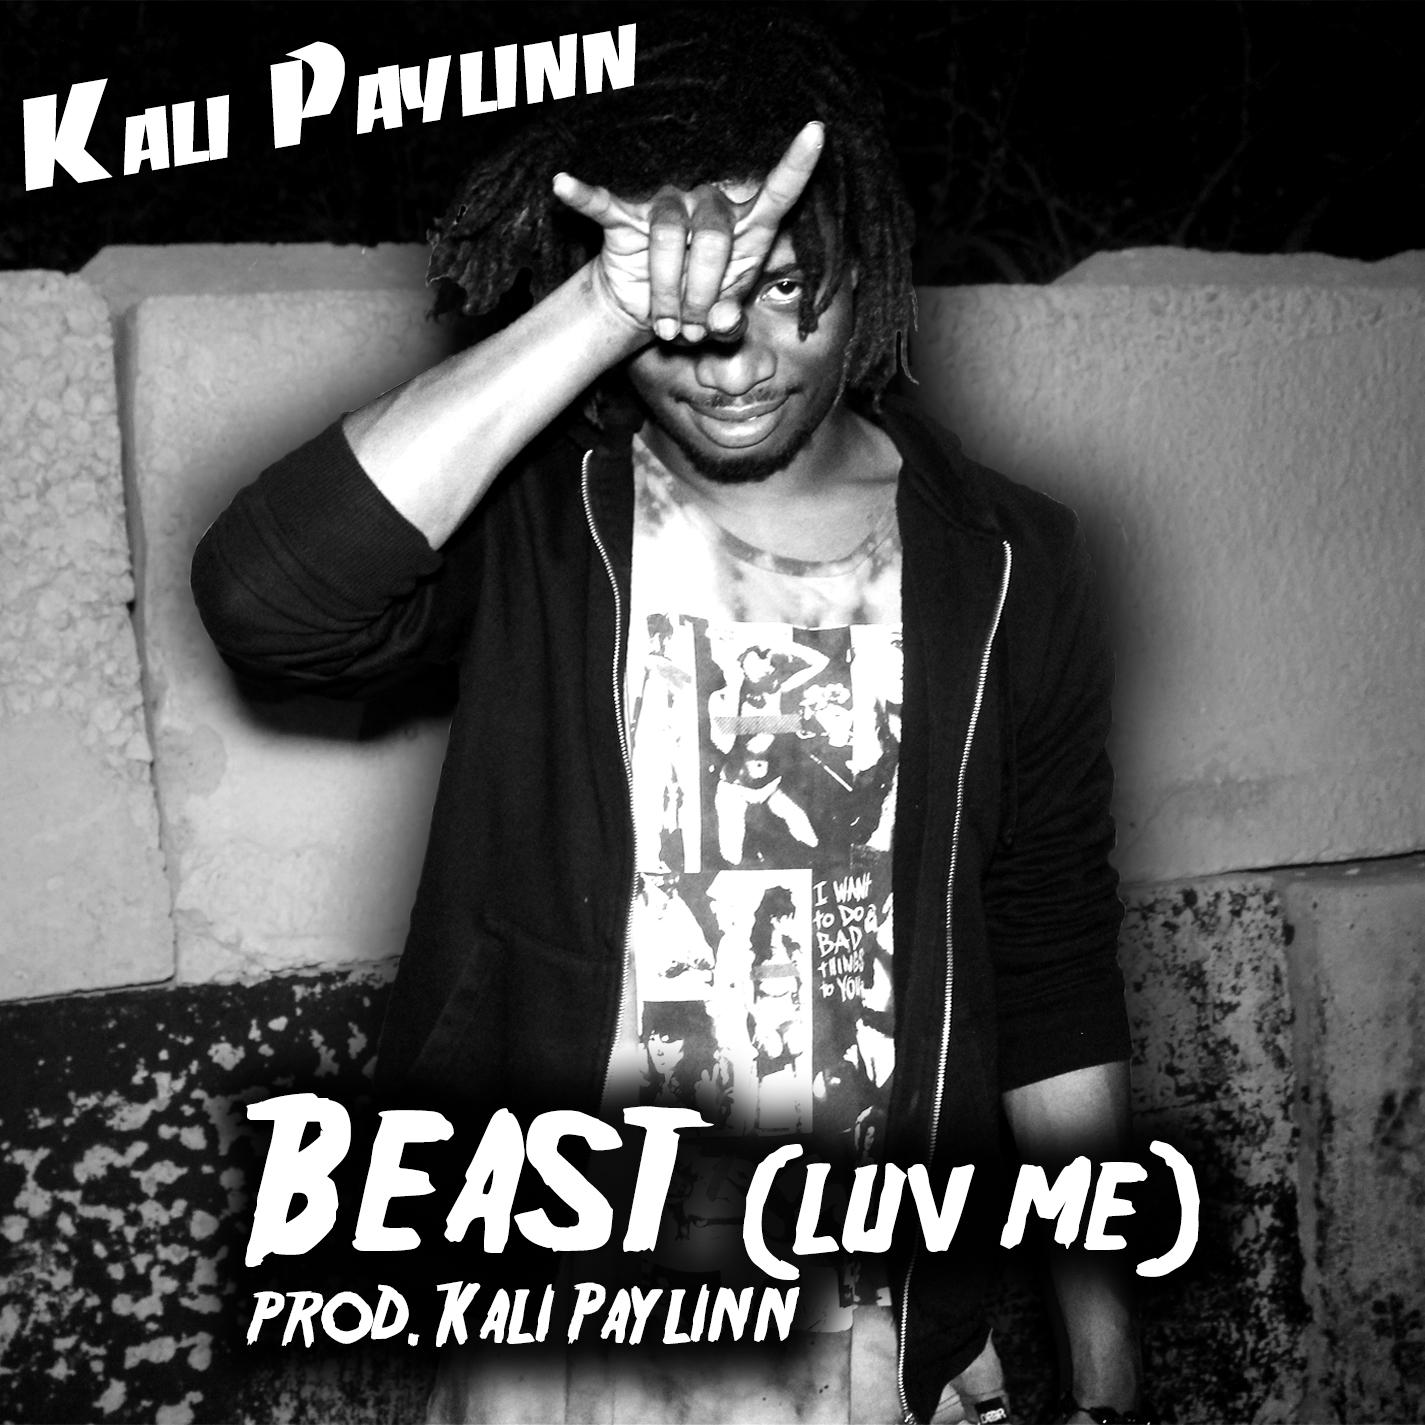 Kali Paylinn- Beast (LUV ME)